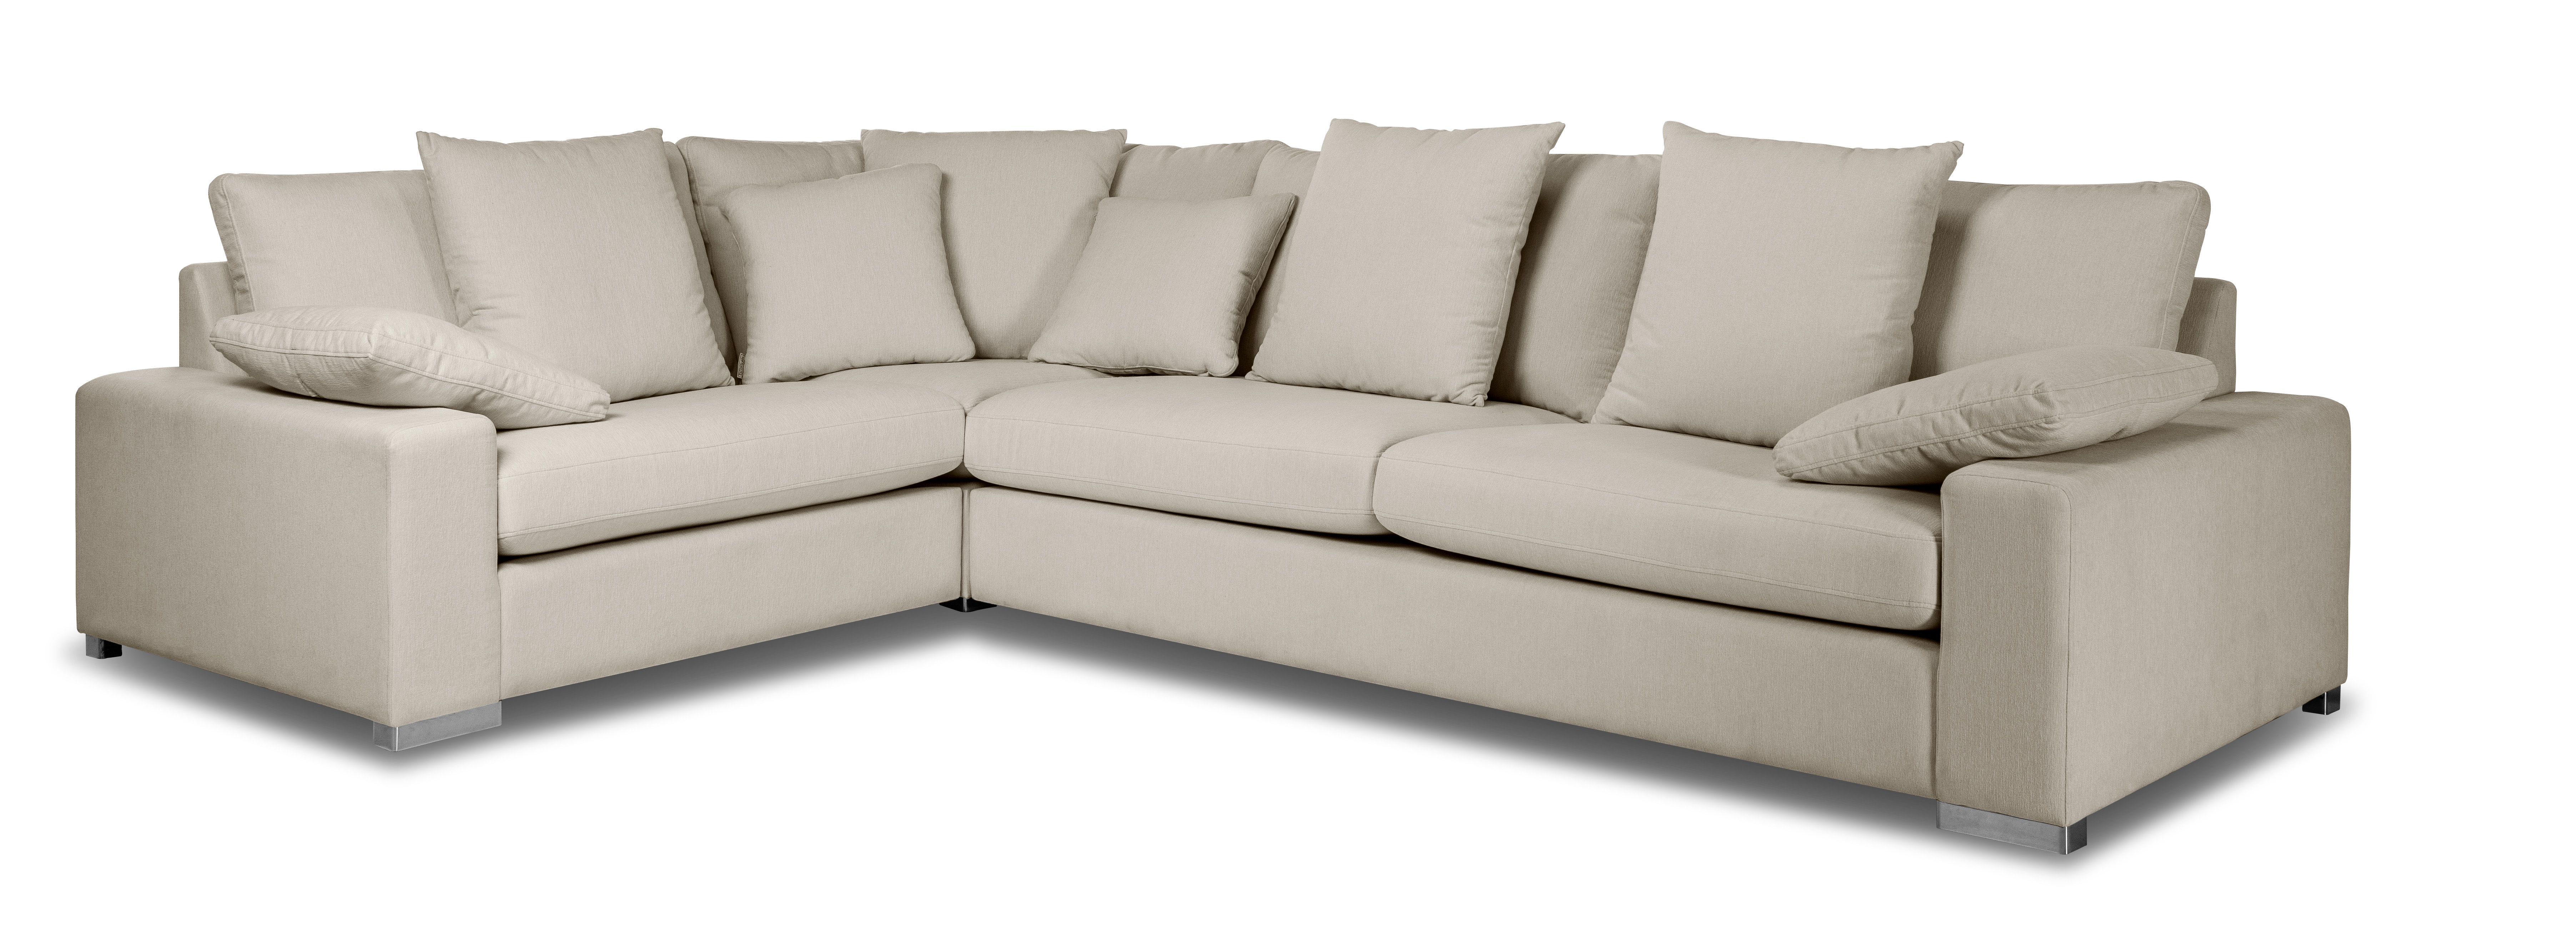 Coltar fix Italia Komfort cu sezlong pe stanga